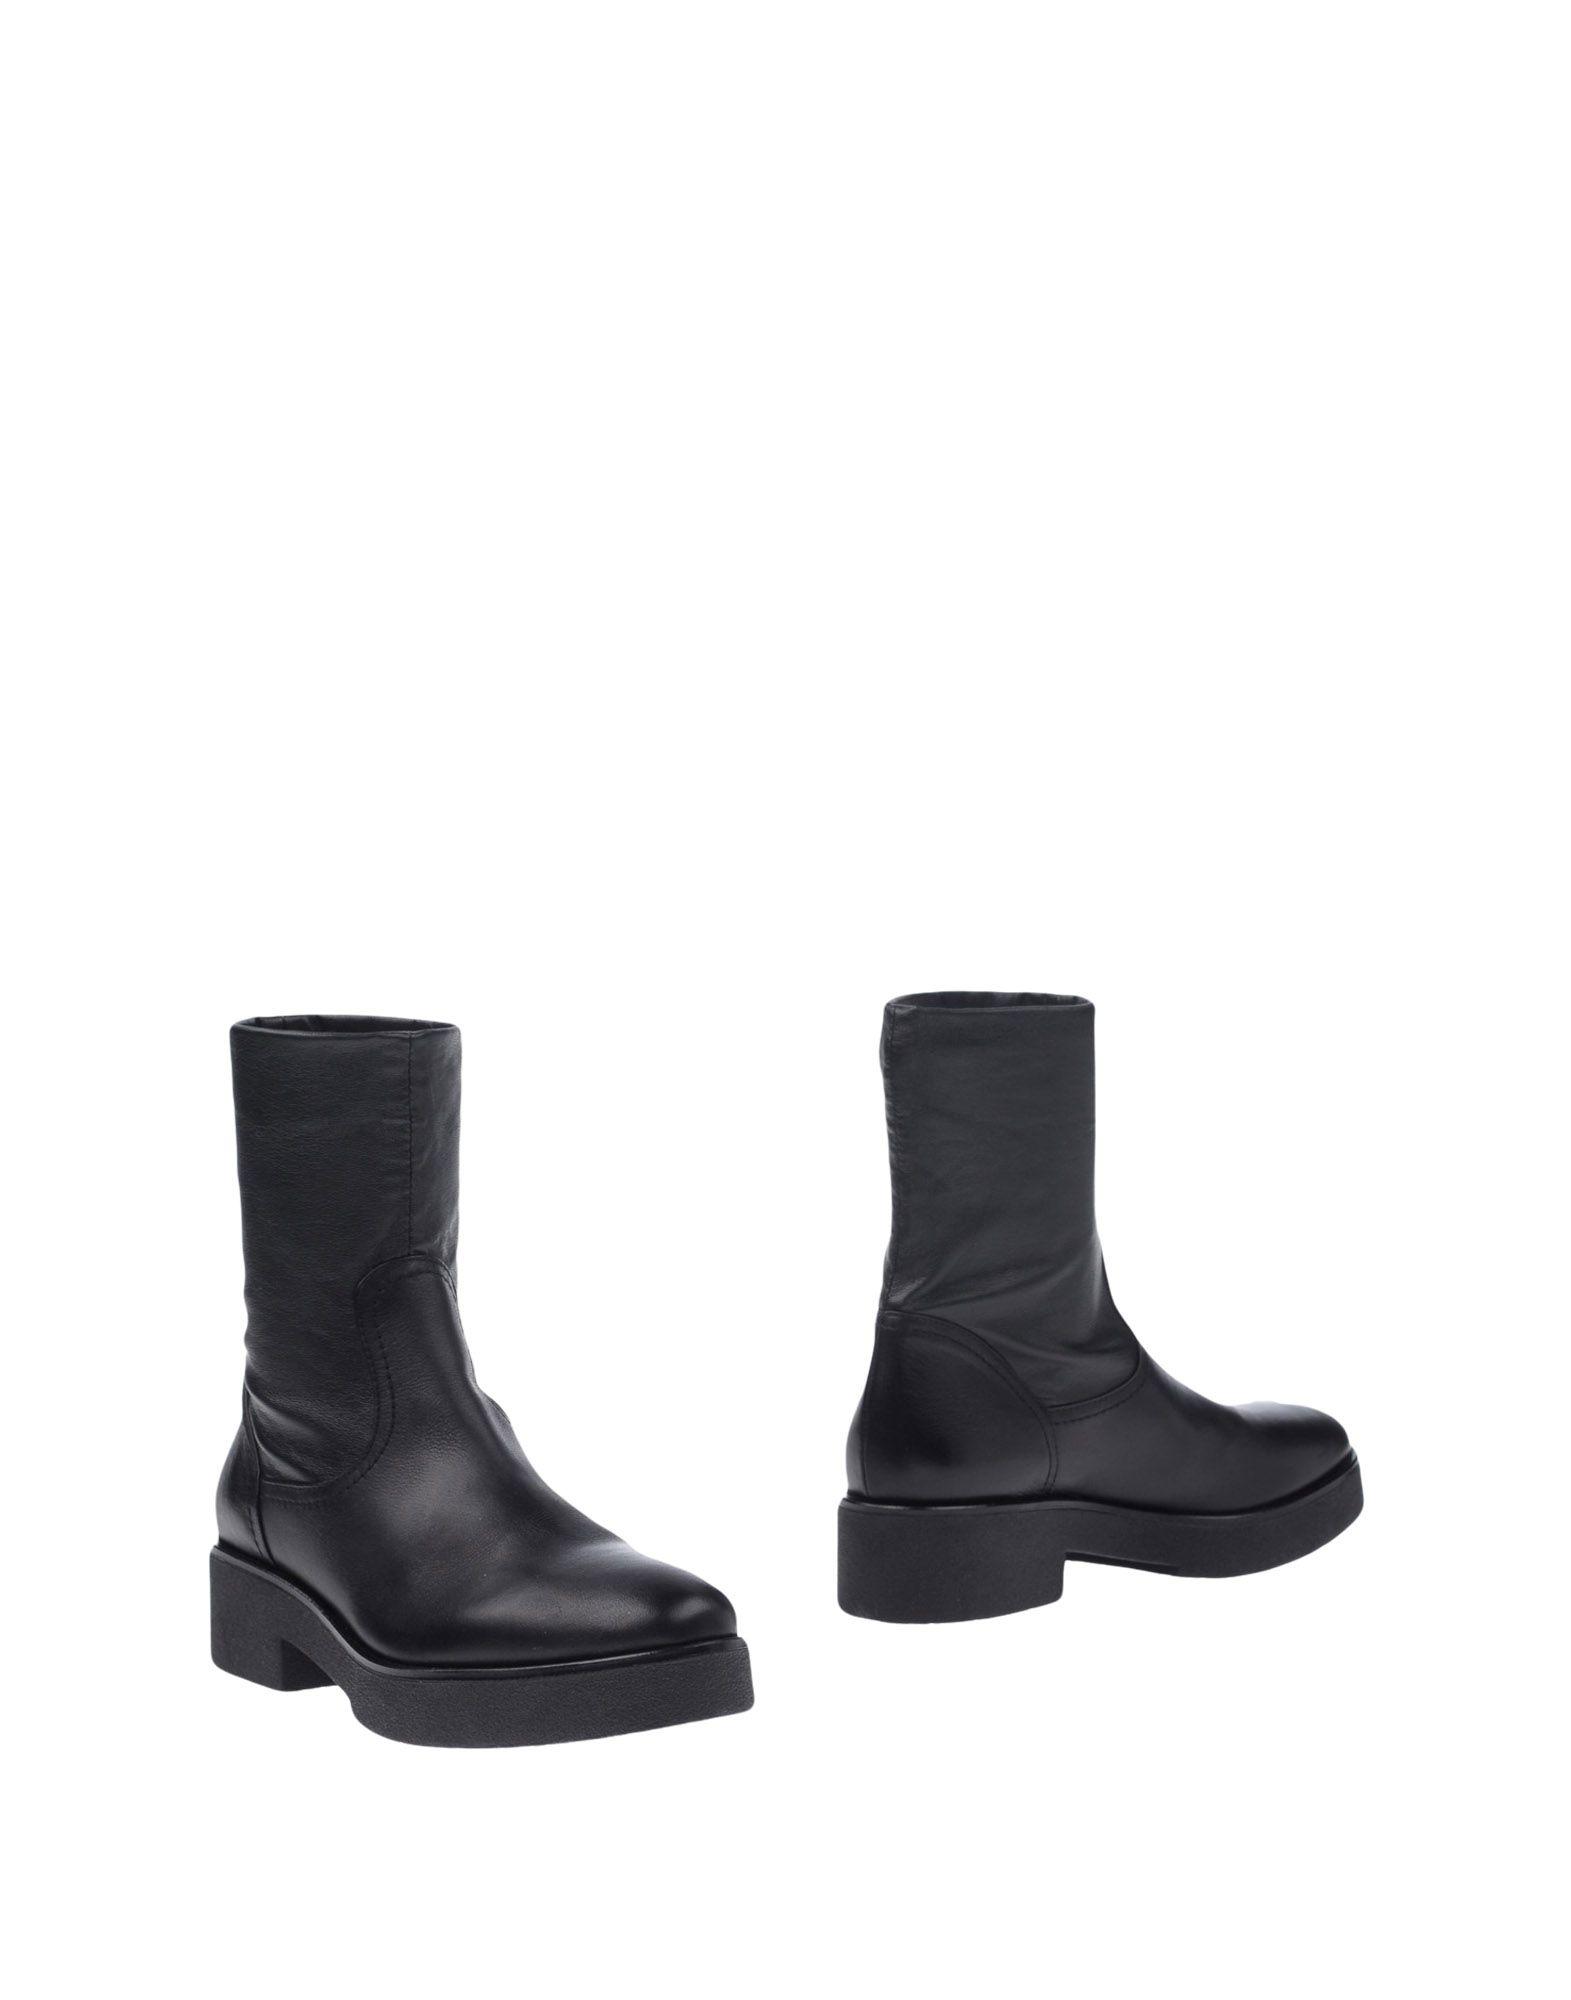 BRYAN BLAKE Полусапоги и высокие ботинки bryan blake полусапоги и высокие ботинки